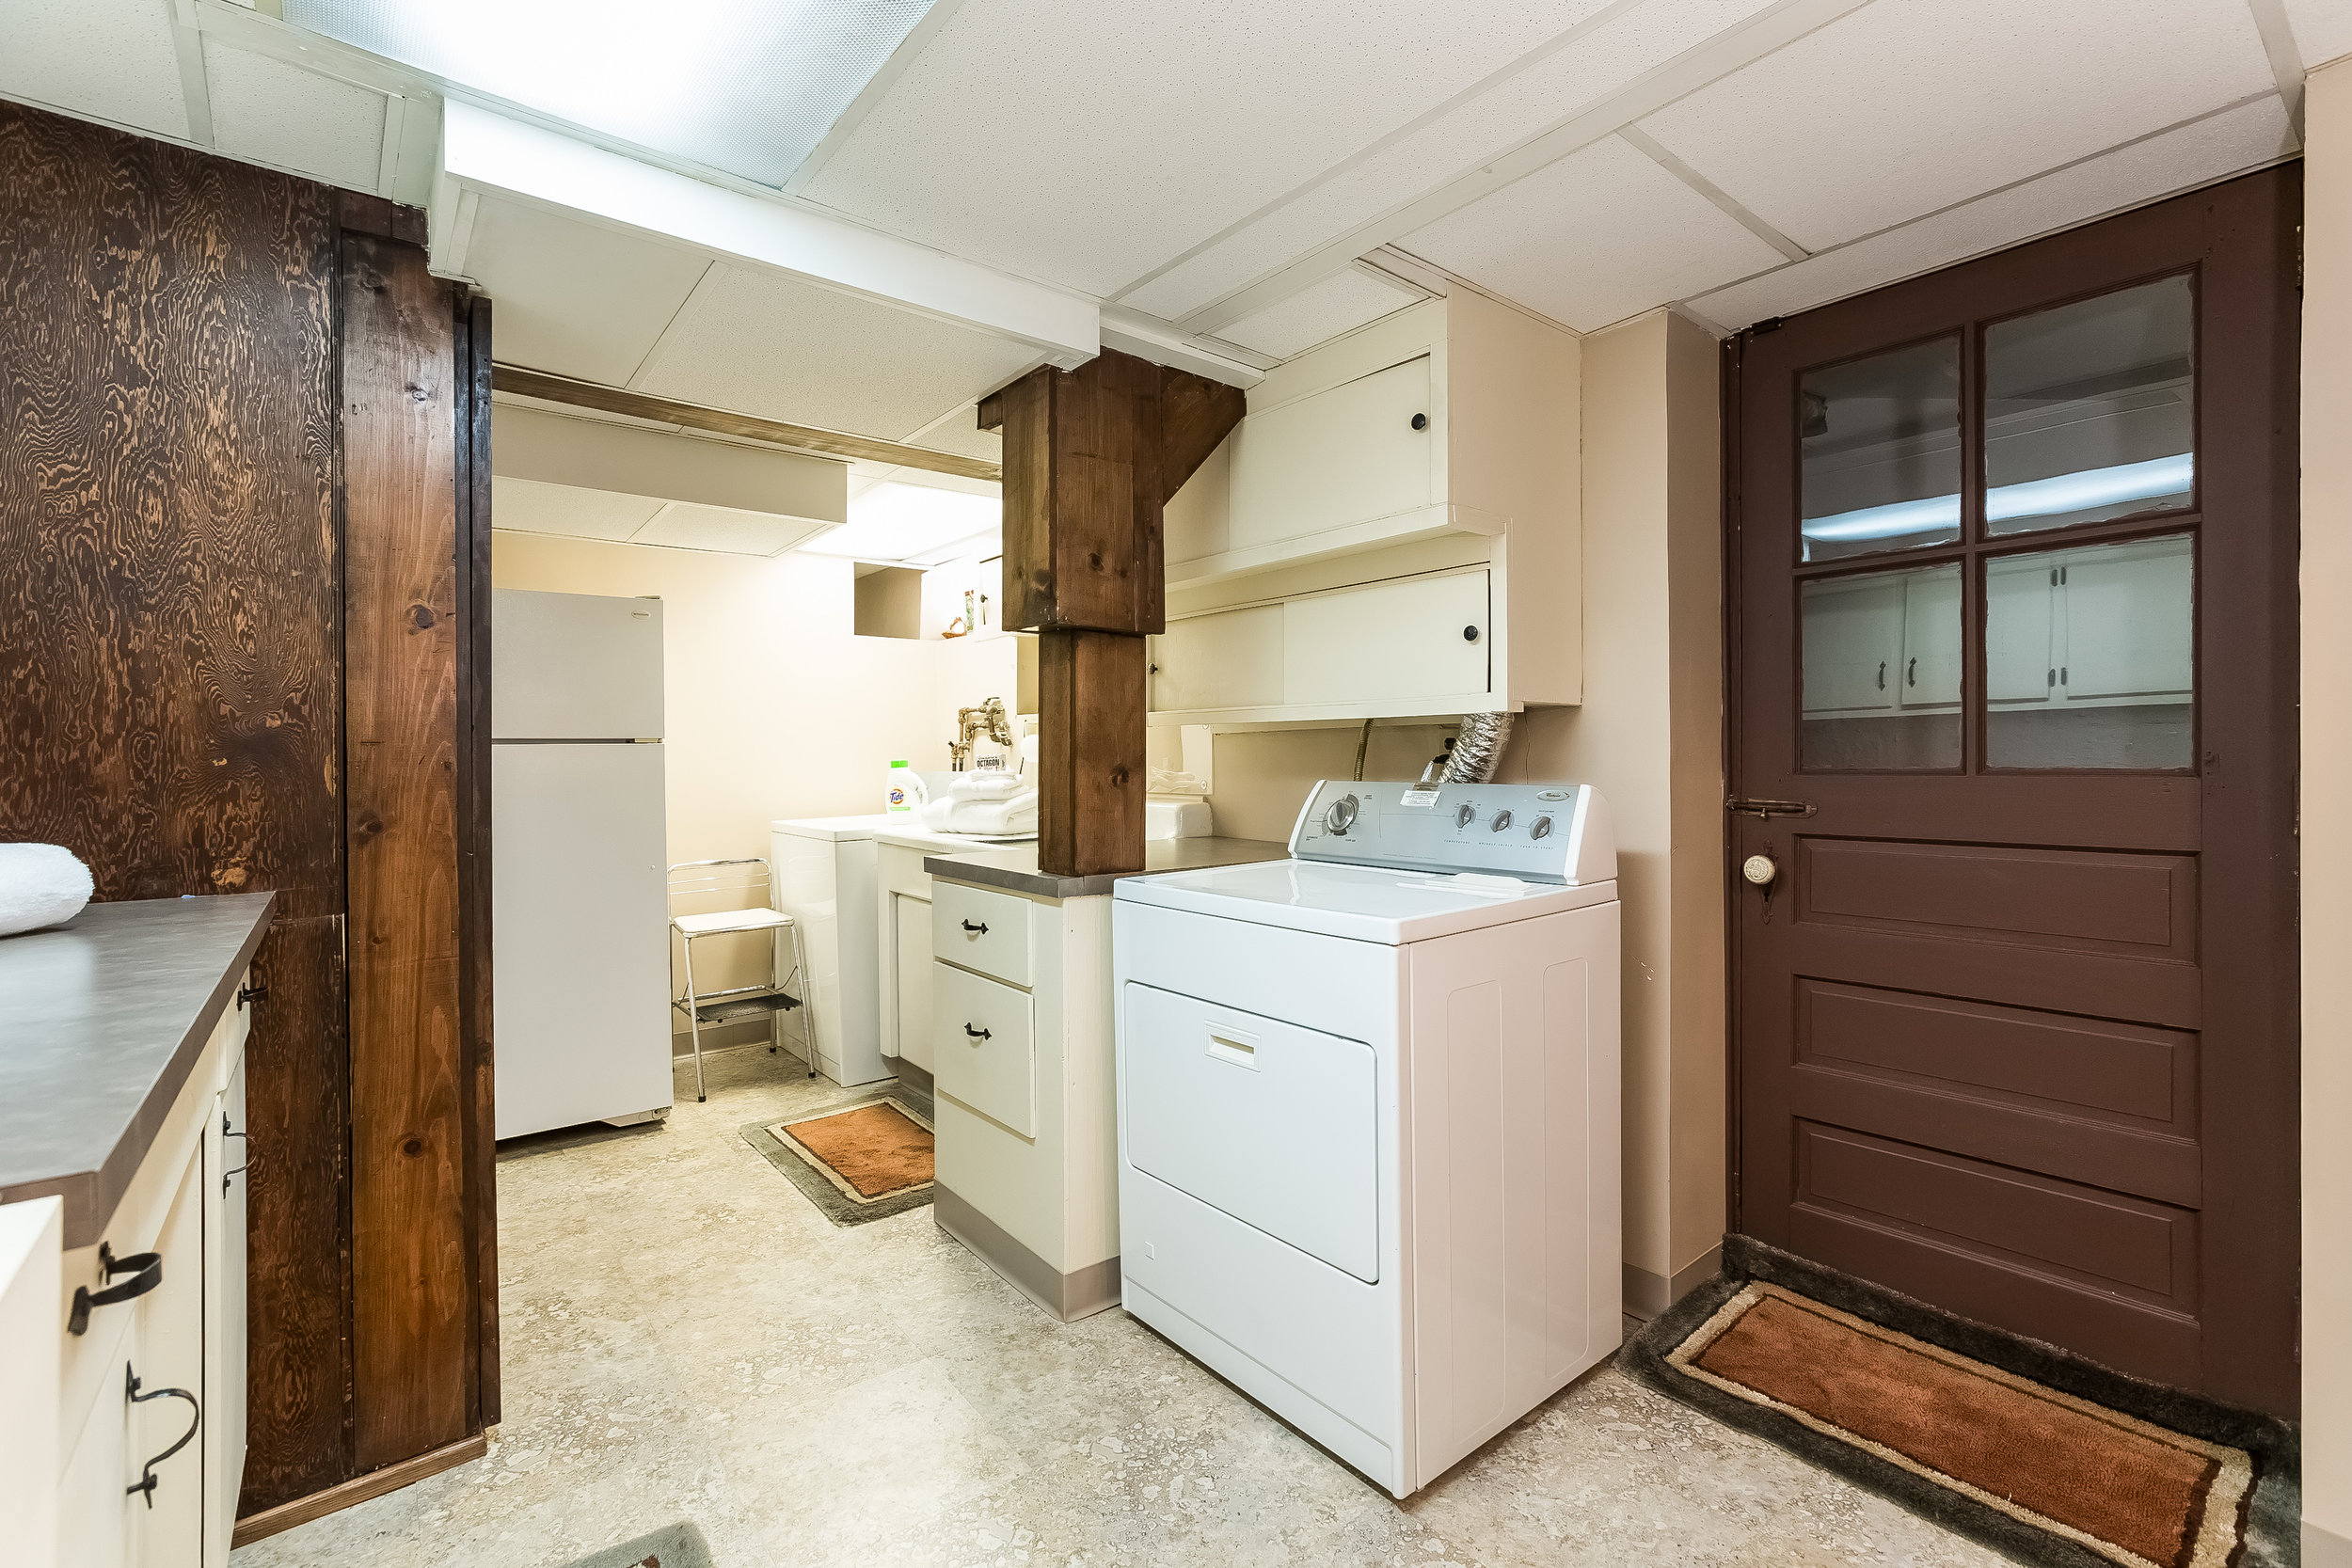 062-Laundry_Room-4932710-large.jpg